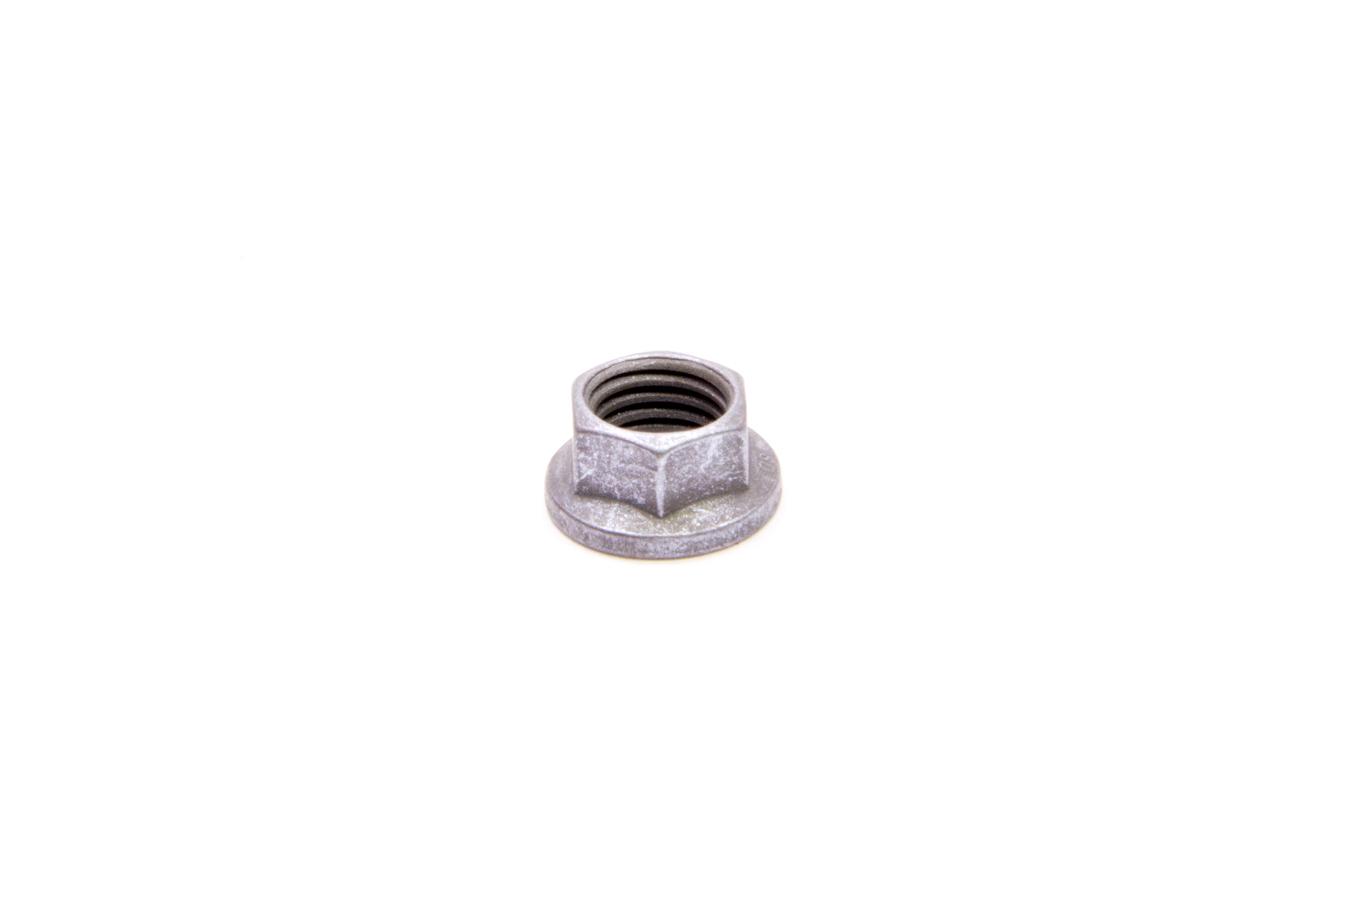 Arp Self-Locking Hex Nut 5/16-24 (1)